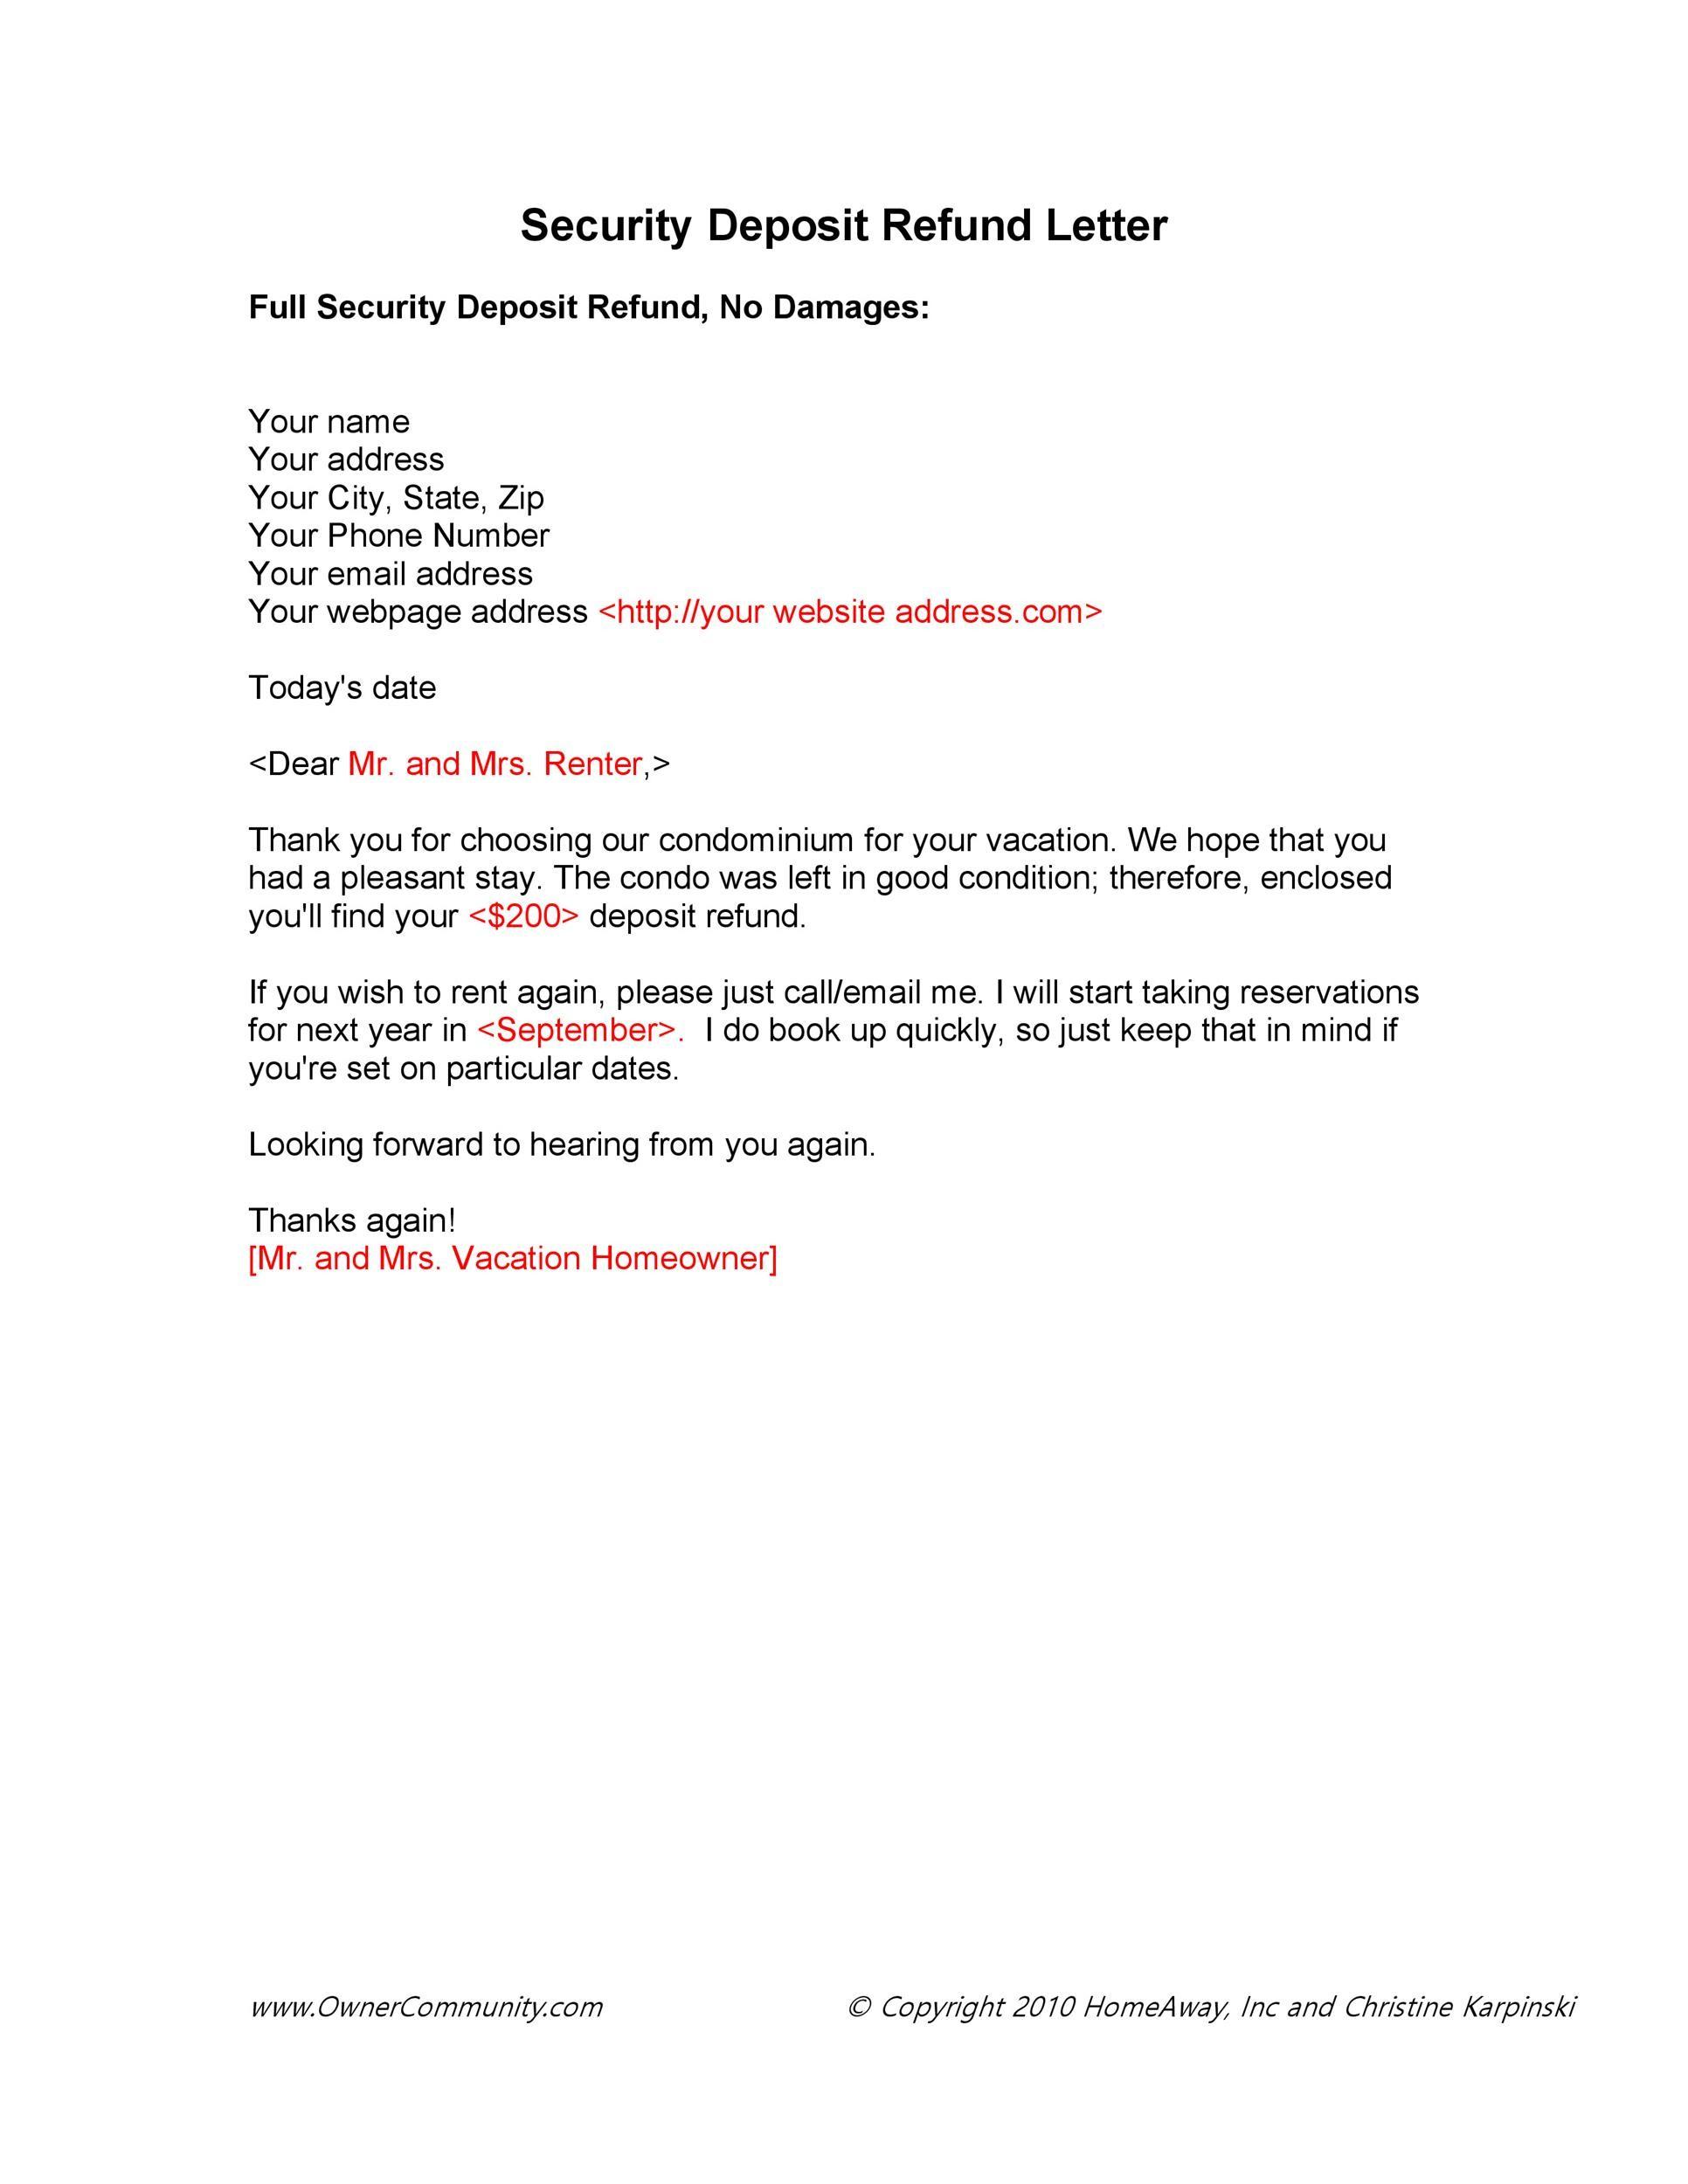 Free security deposit return letter 01